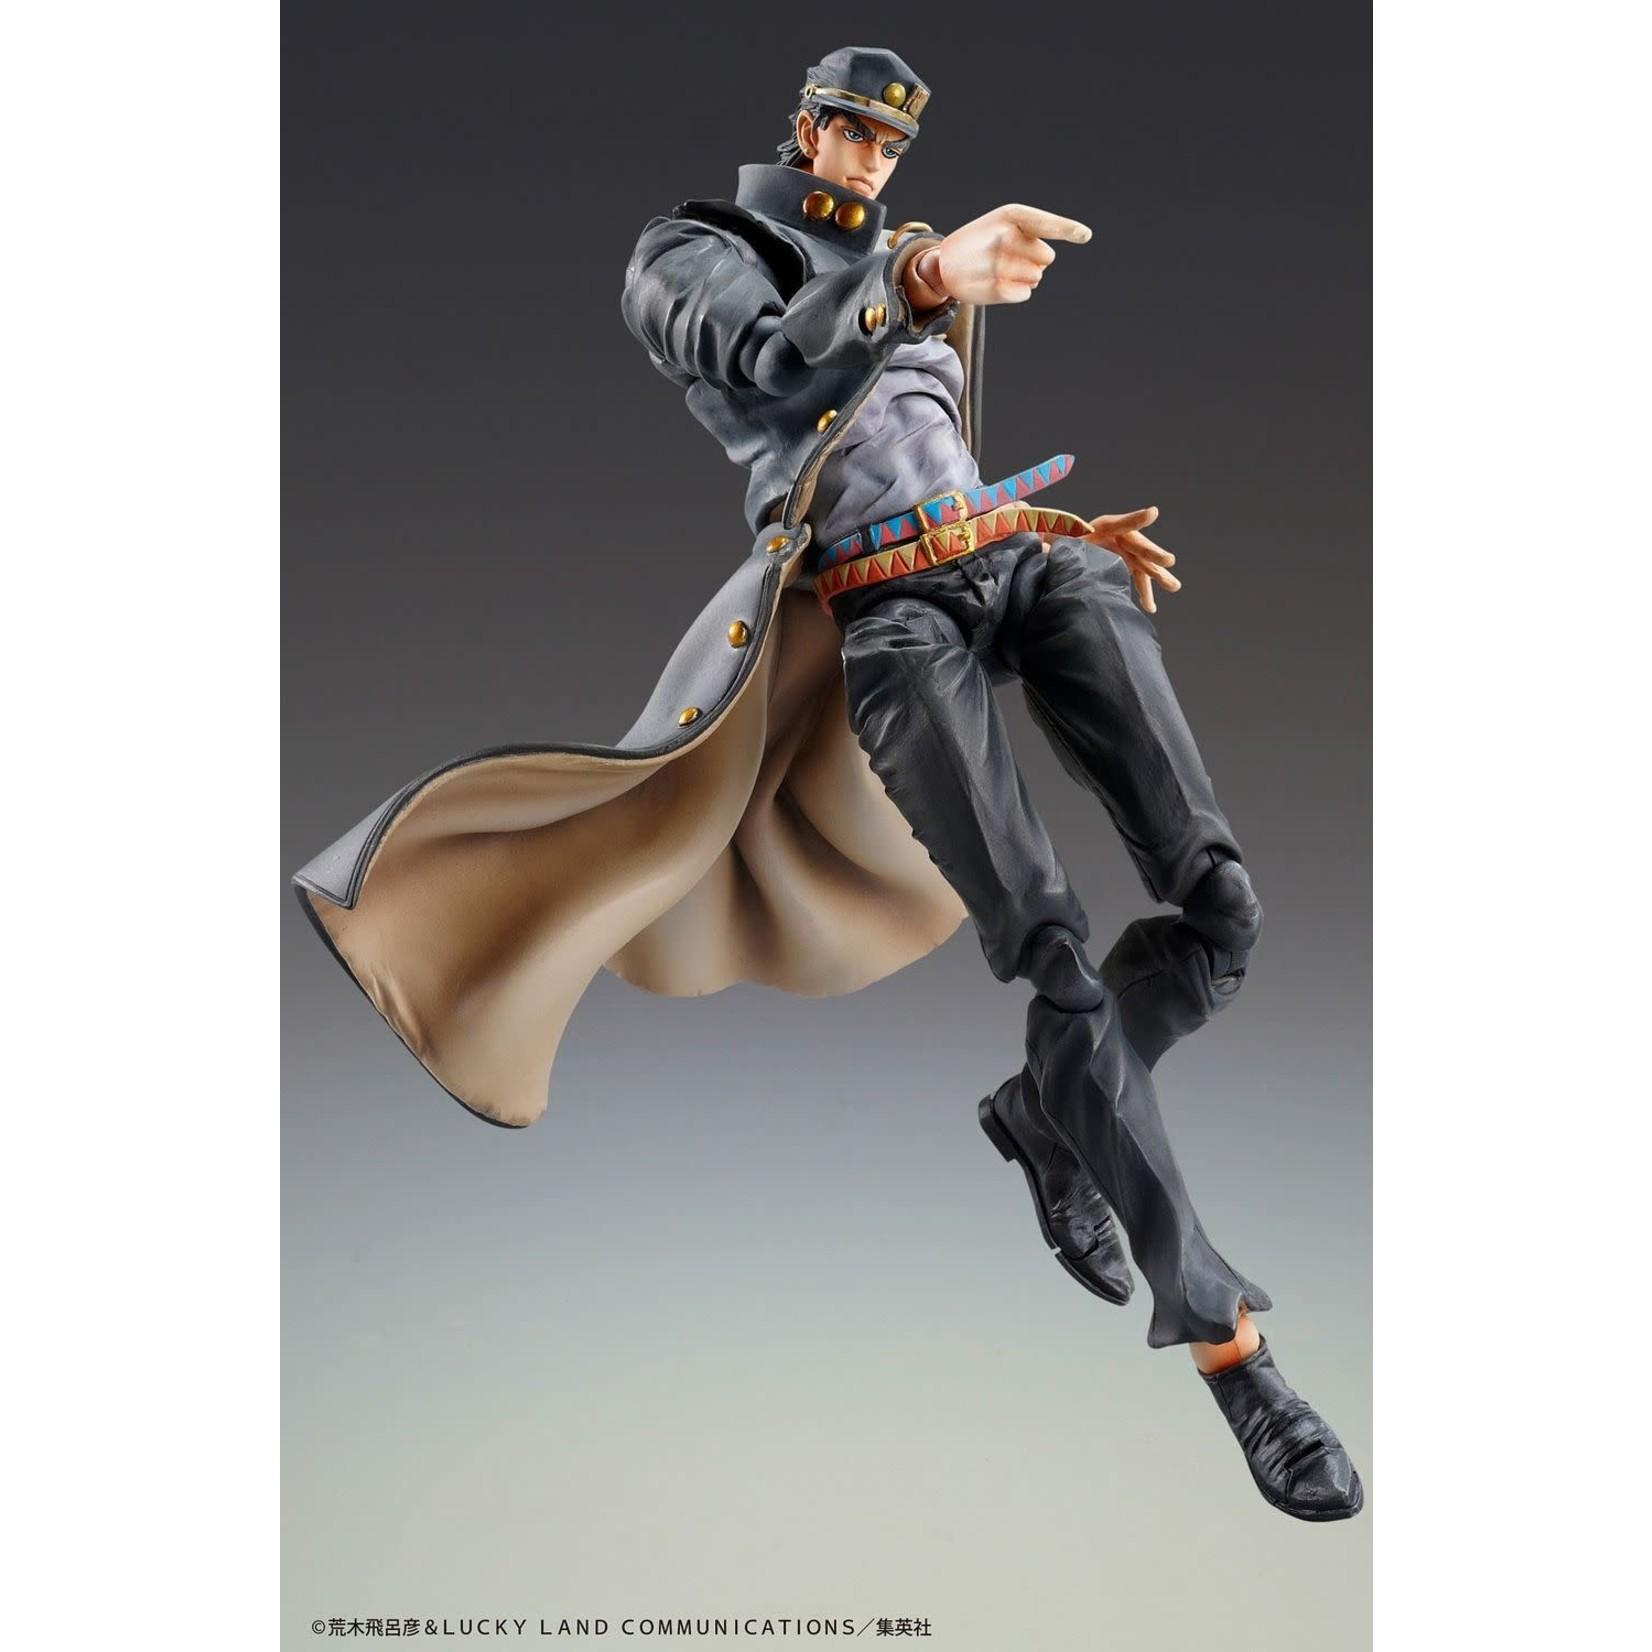 Medicos Super Action Statue: Jotaro Kujo Ver.1.5 (JoJo's Bizarre Adventure Part 3)